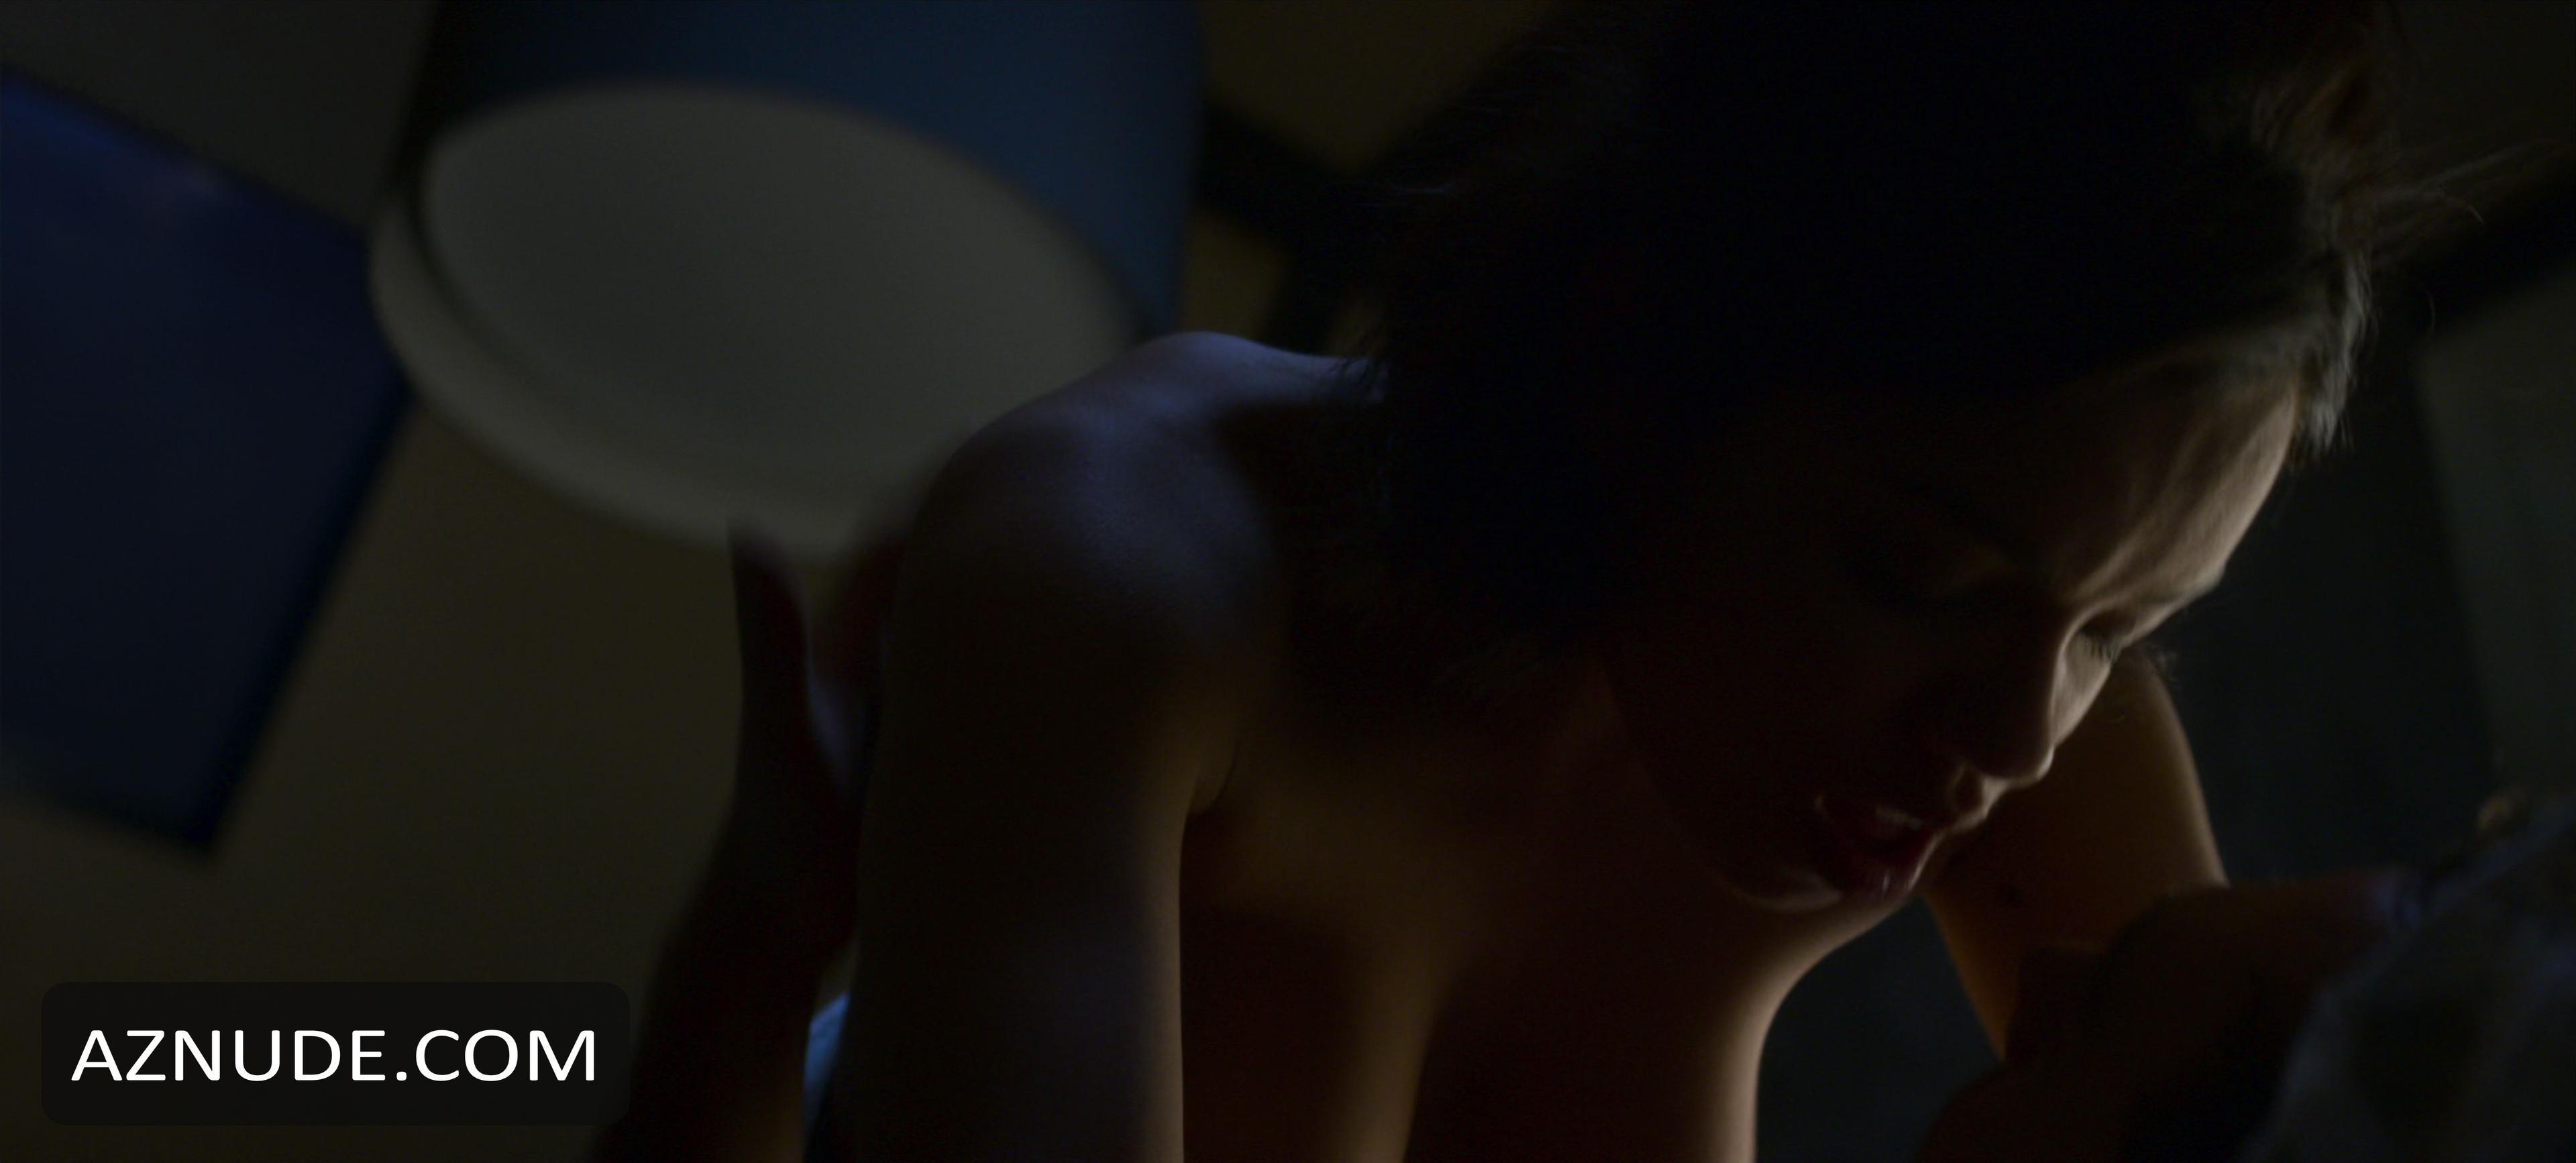 Naked girls doing nasty things